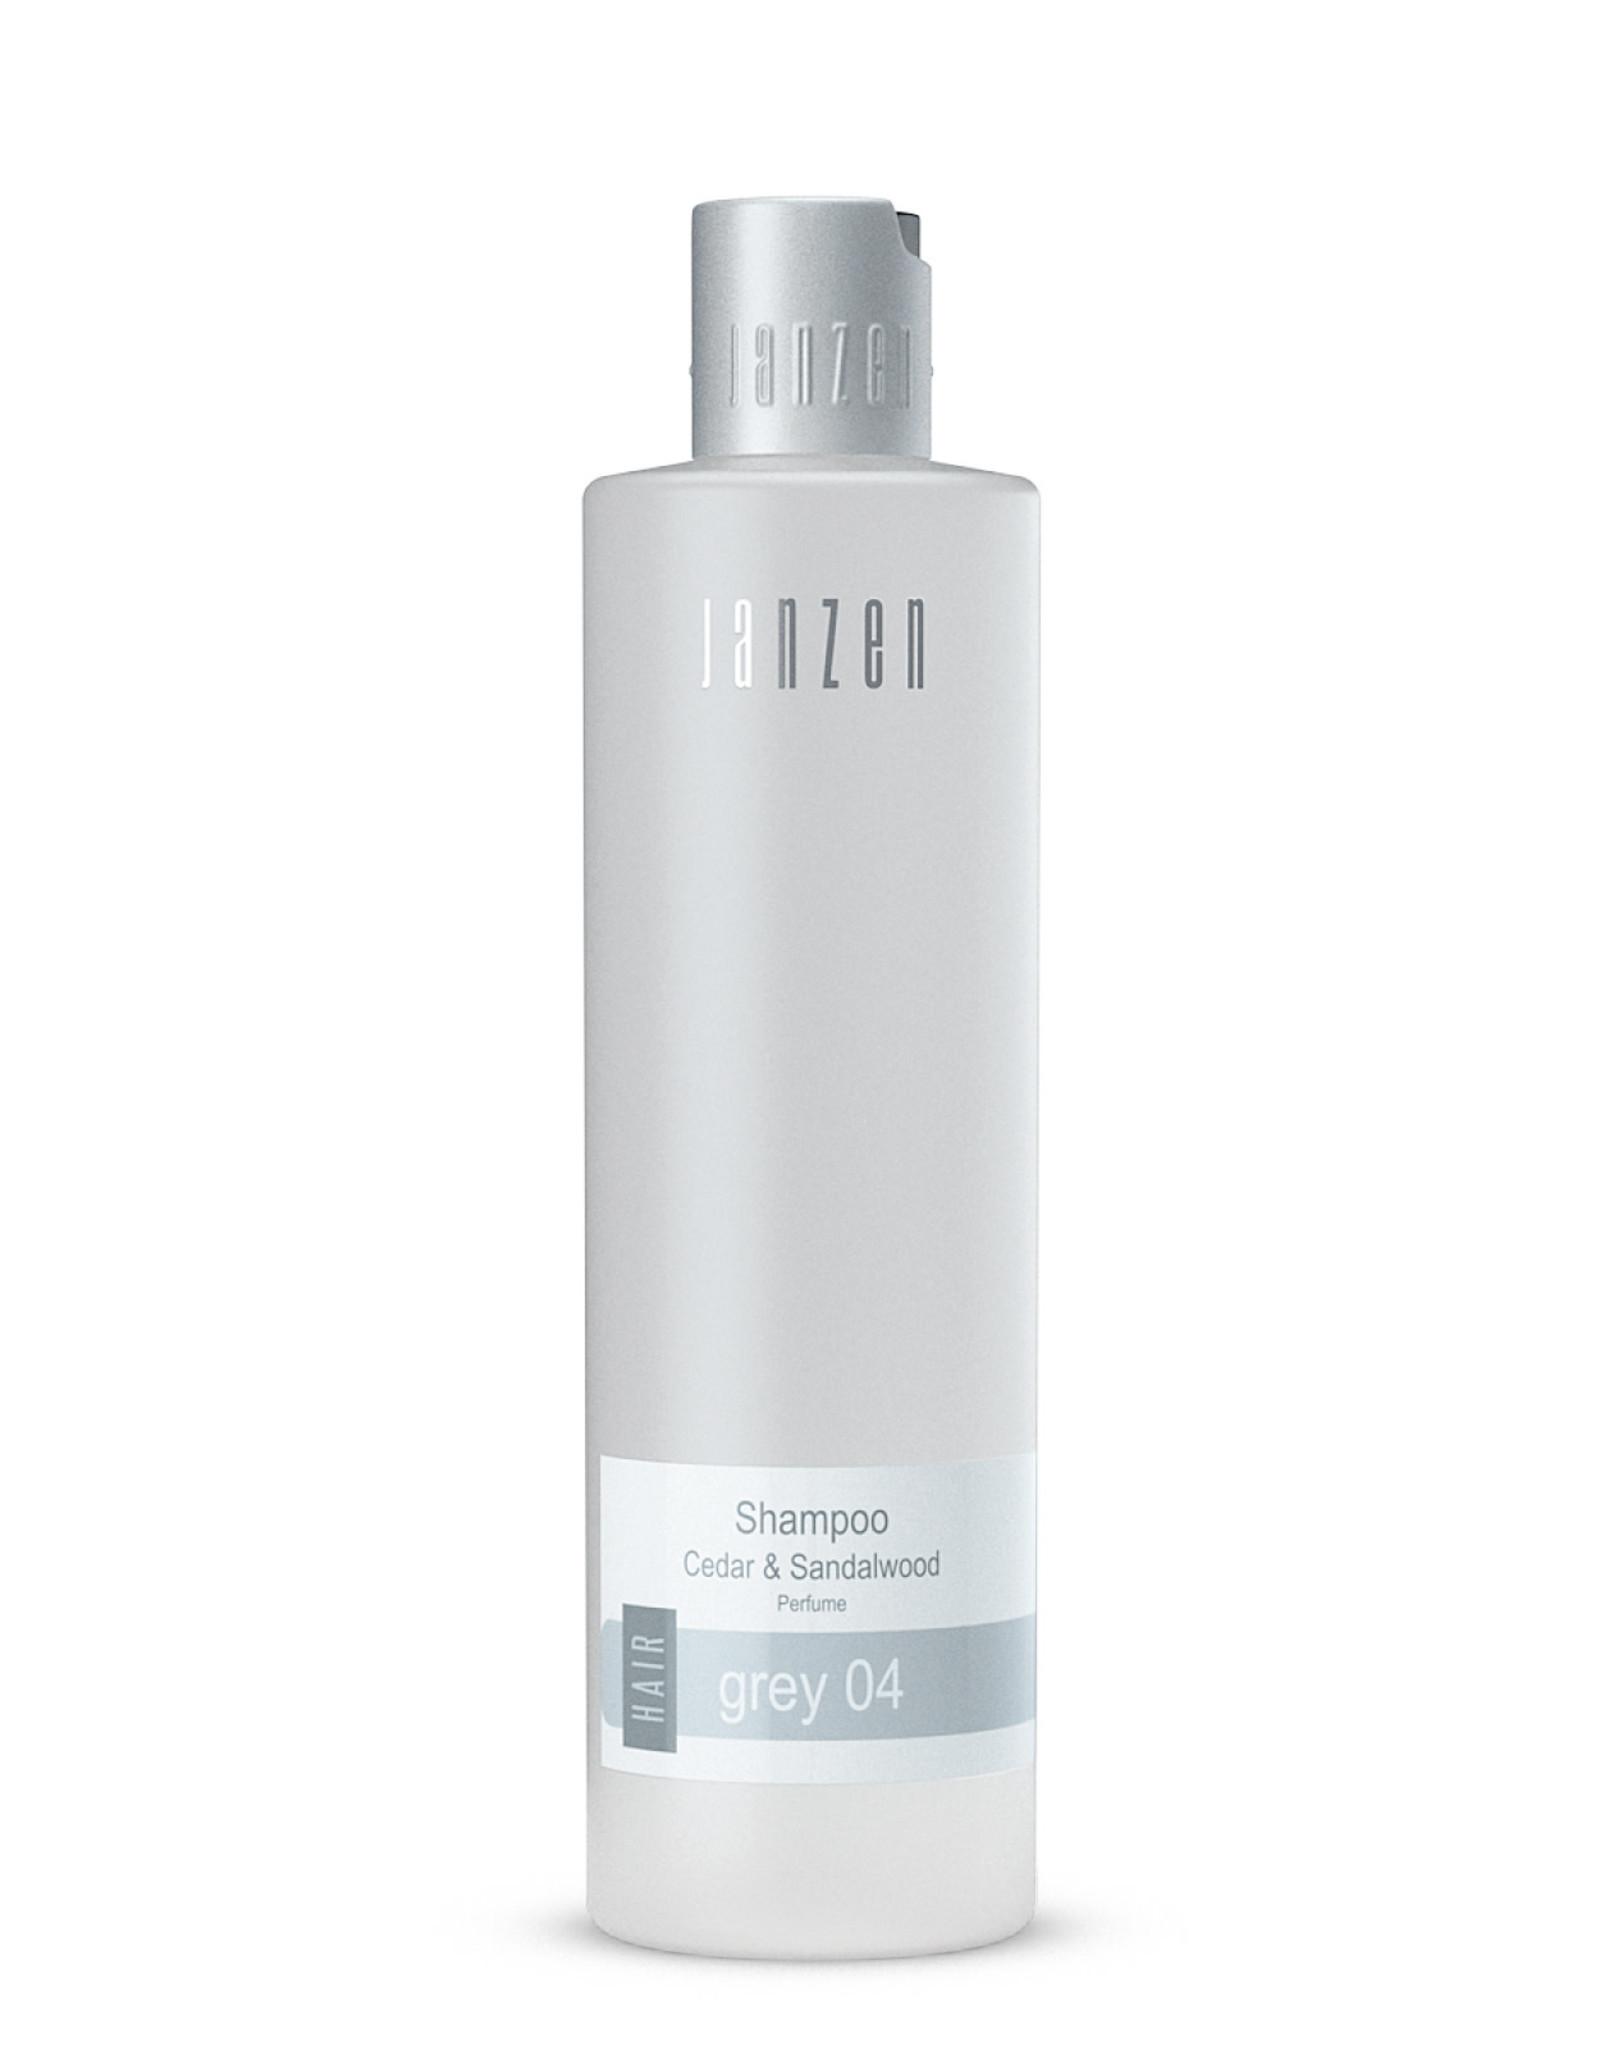 JANZEN Shampoo Grey 04 300ml - JANZEN